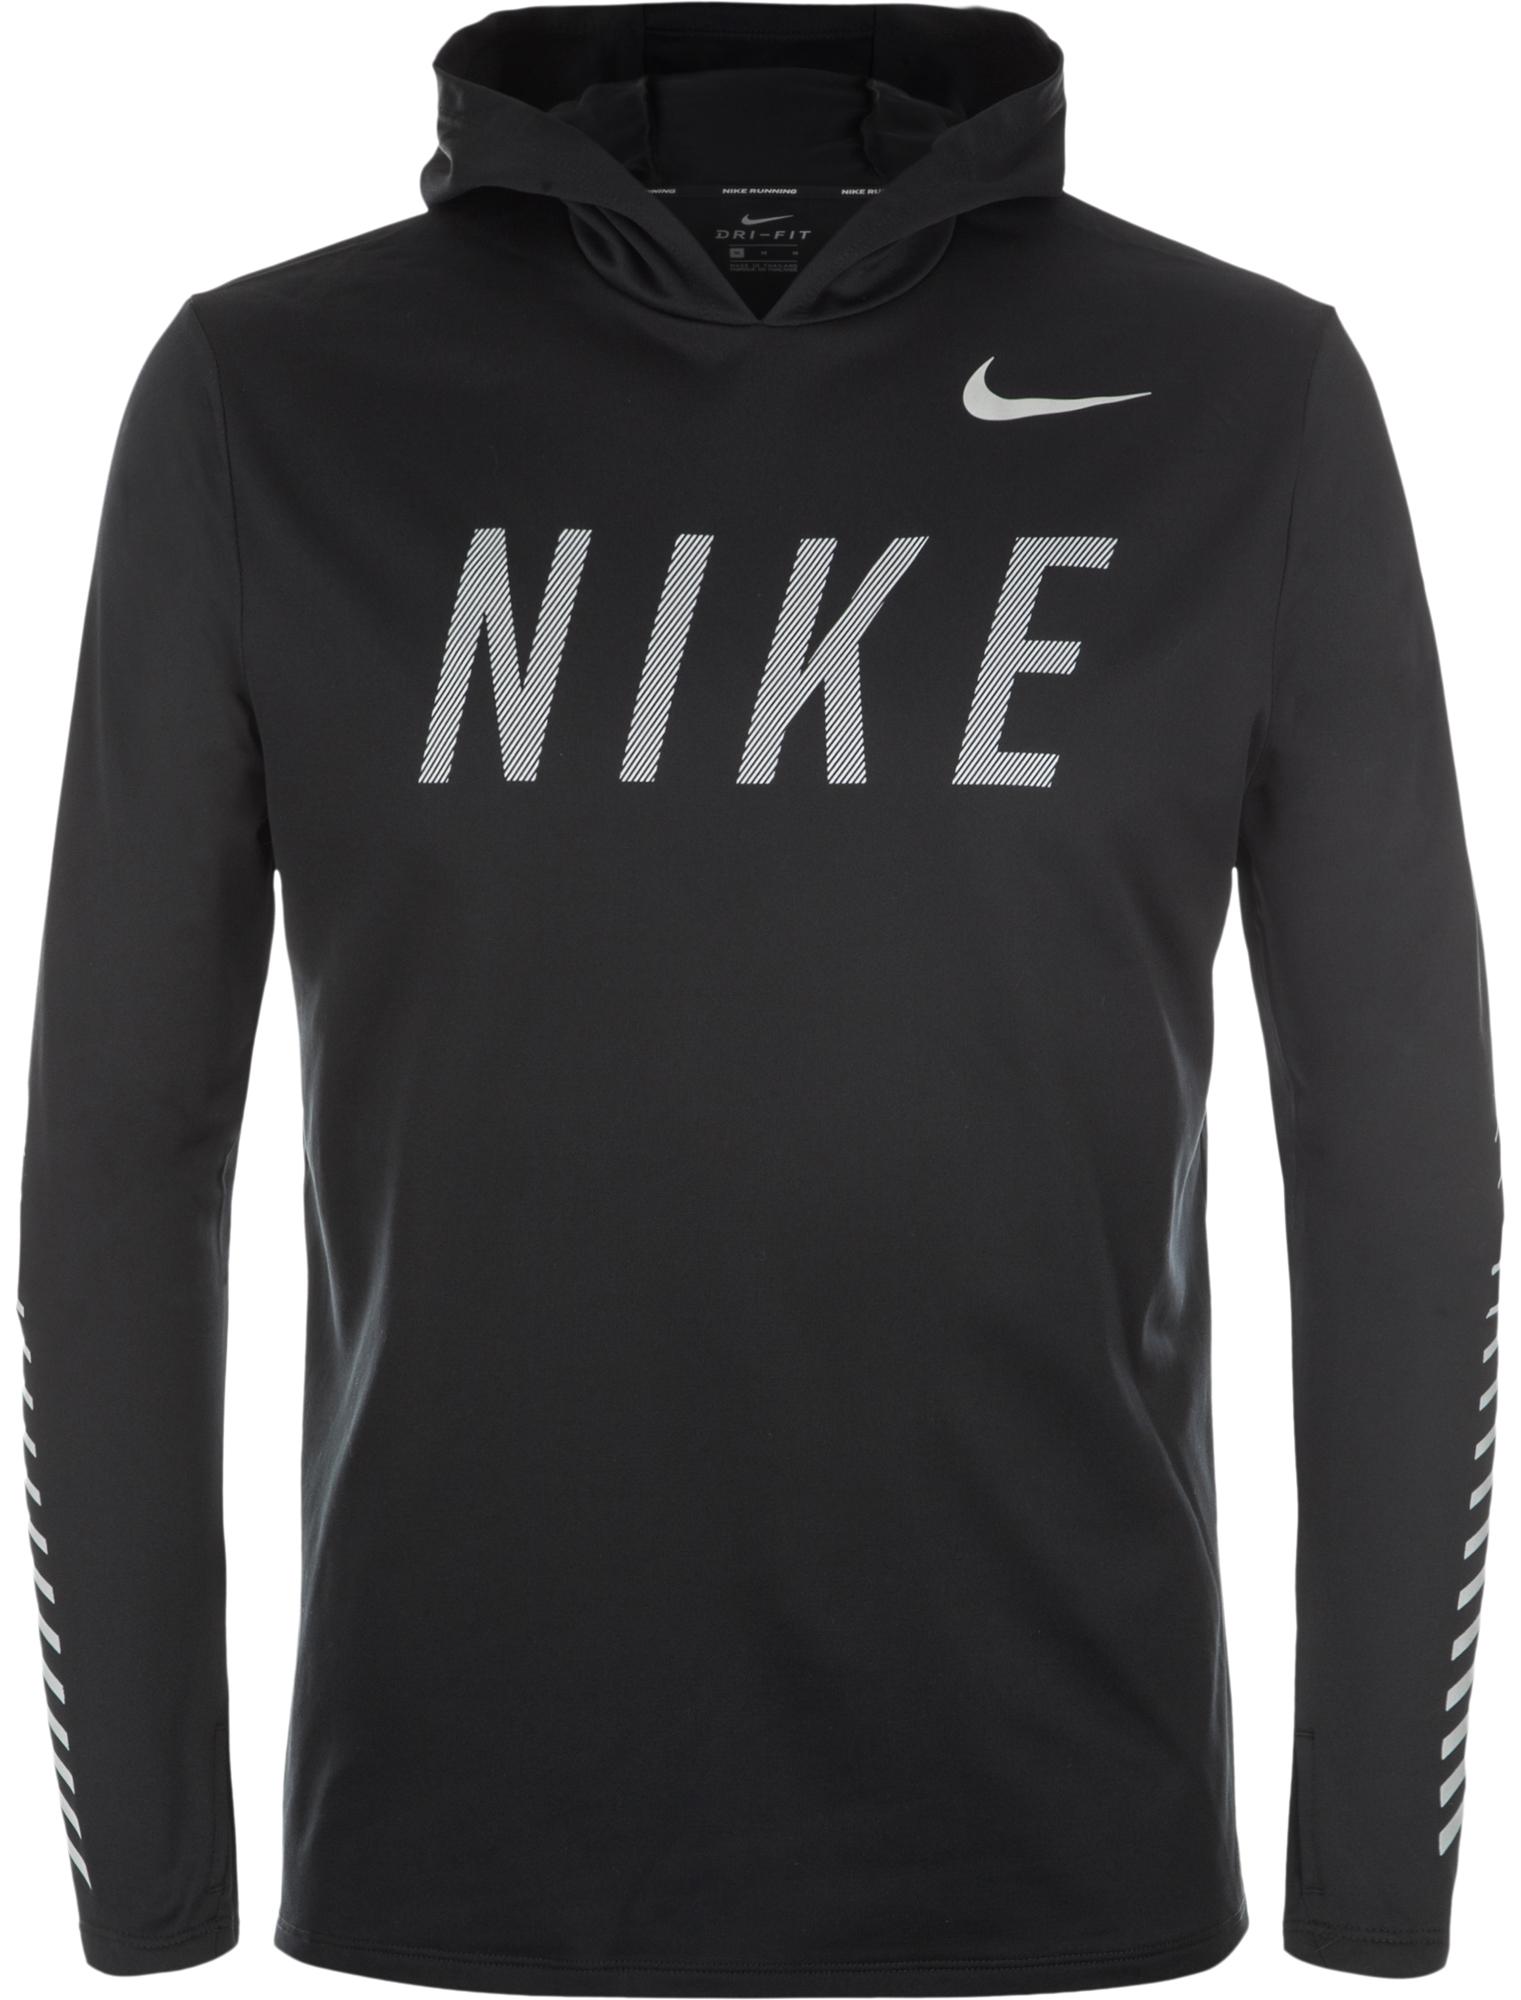 Nike Джемпер мужской Nike Miler джемпер мужской шерсть